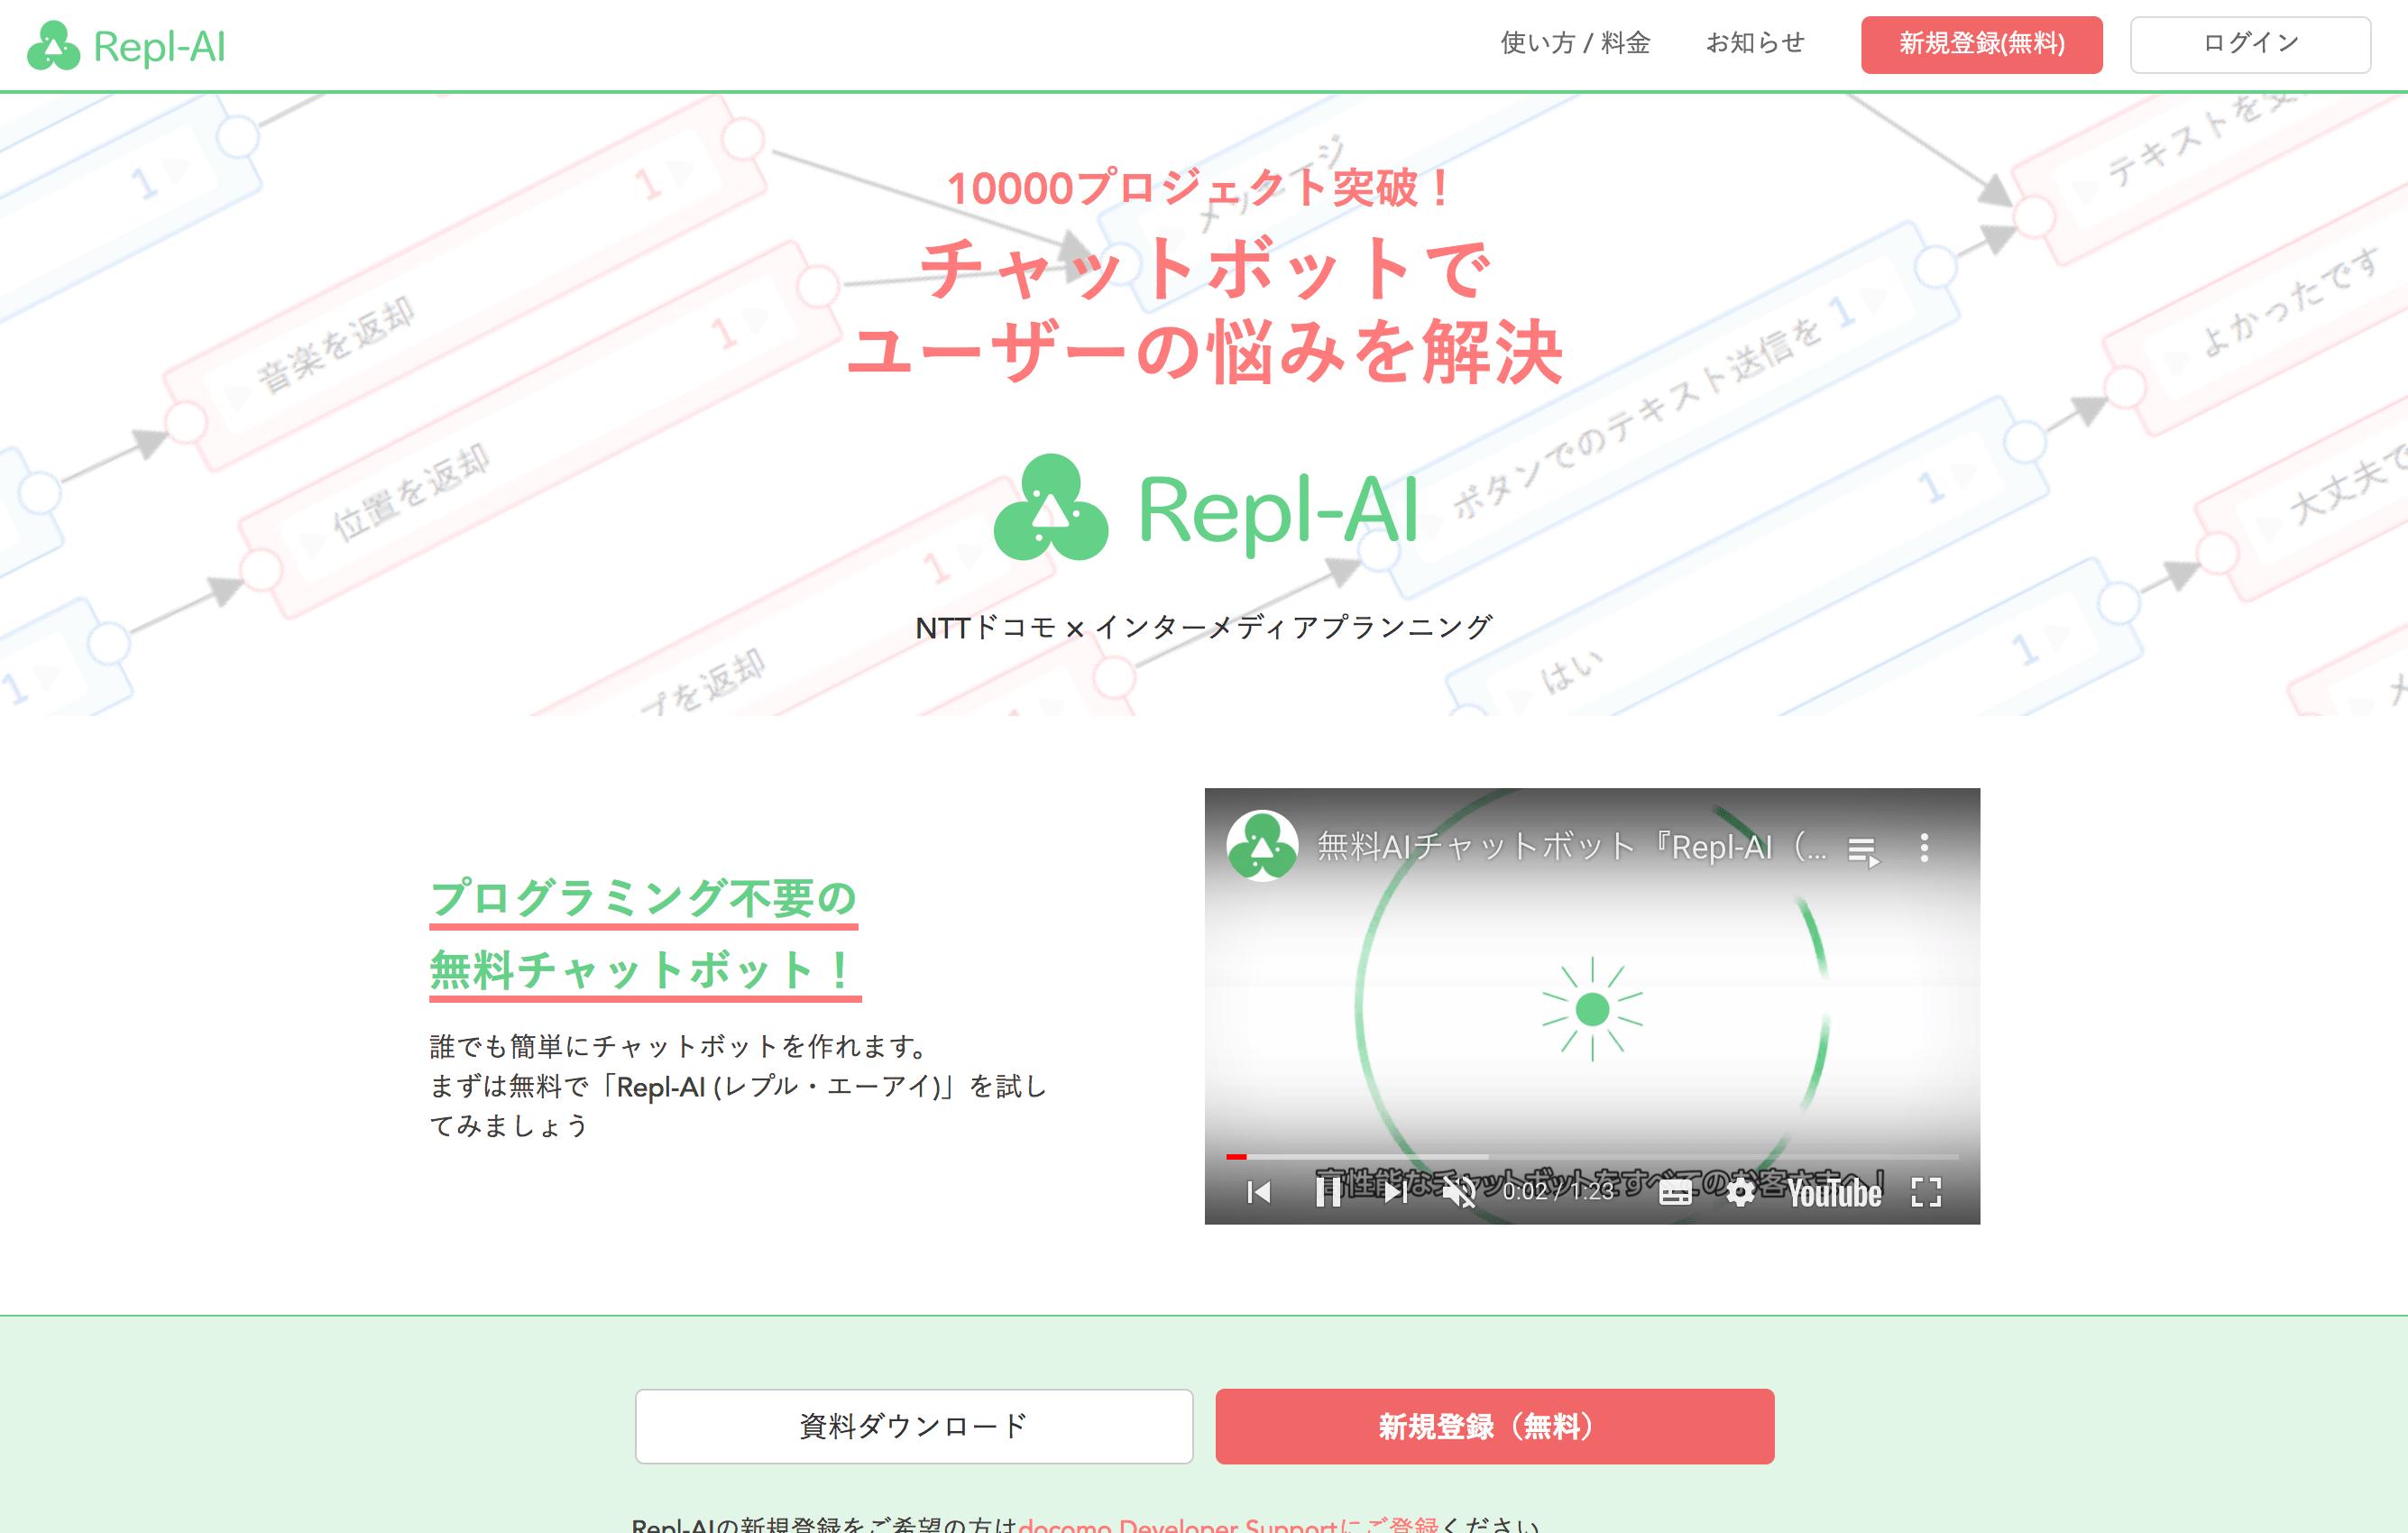 Repl-AI(レプルエーアイ)